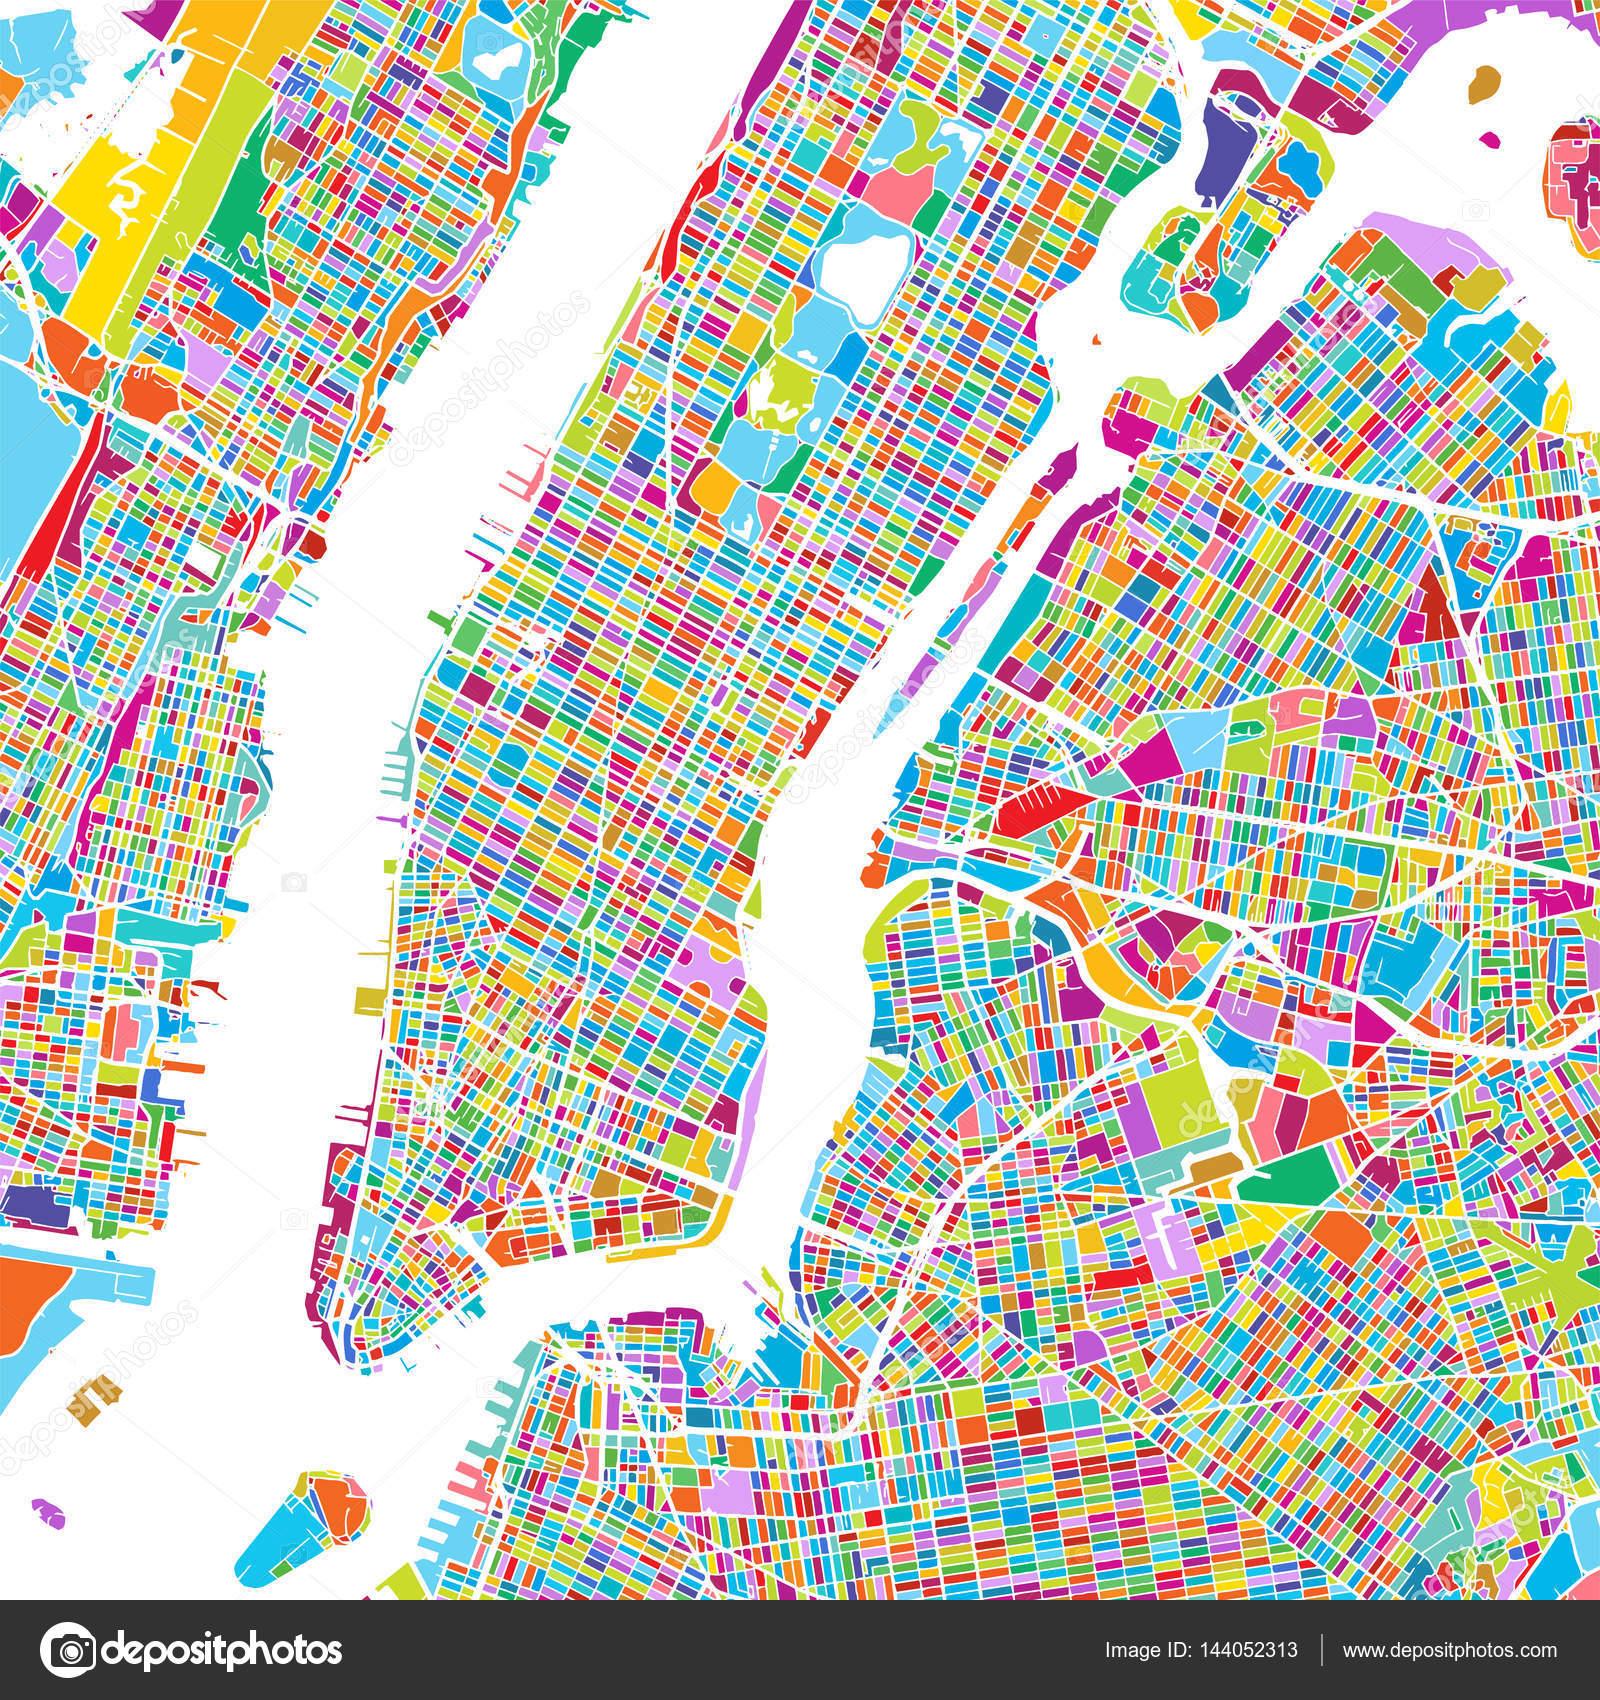 Map Of New York City Manhattan.New York City Manhattan Colorful Map Stock Vector C Mail Hebstreit